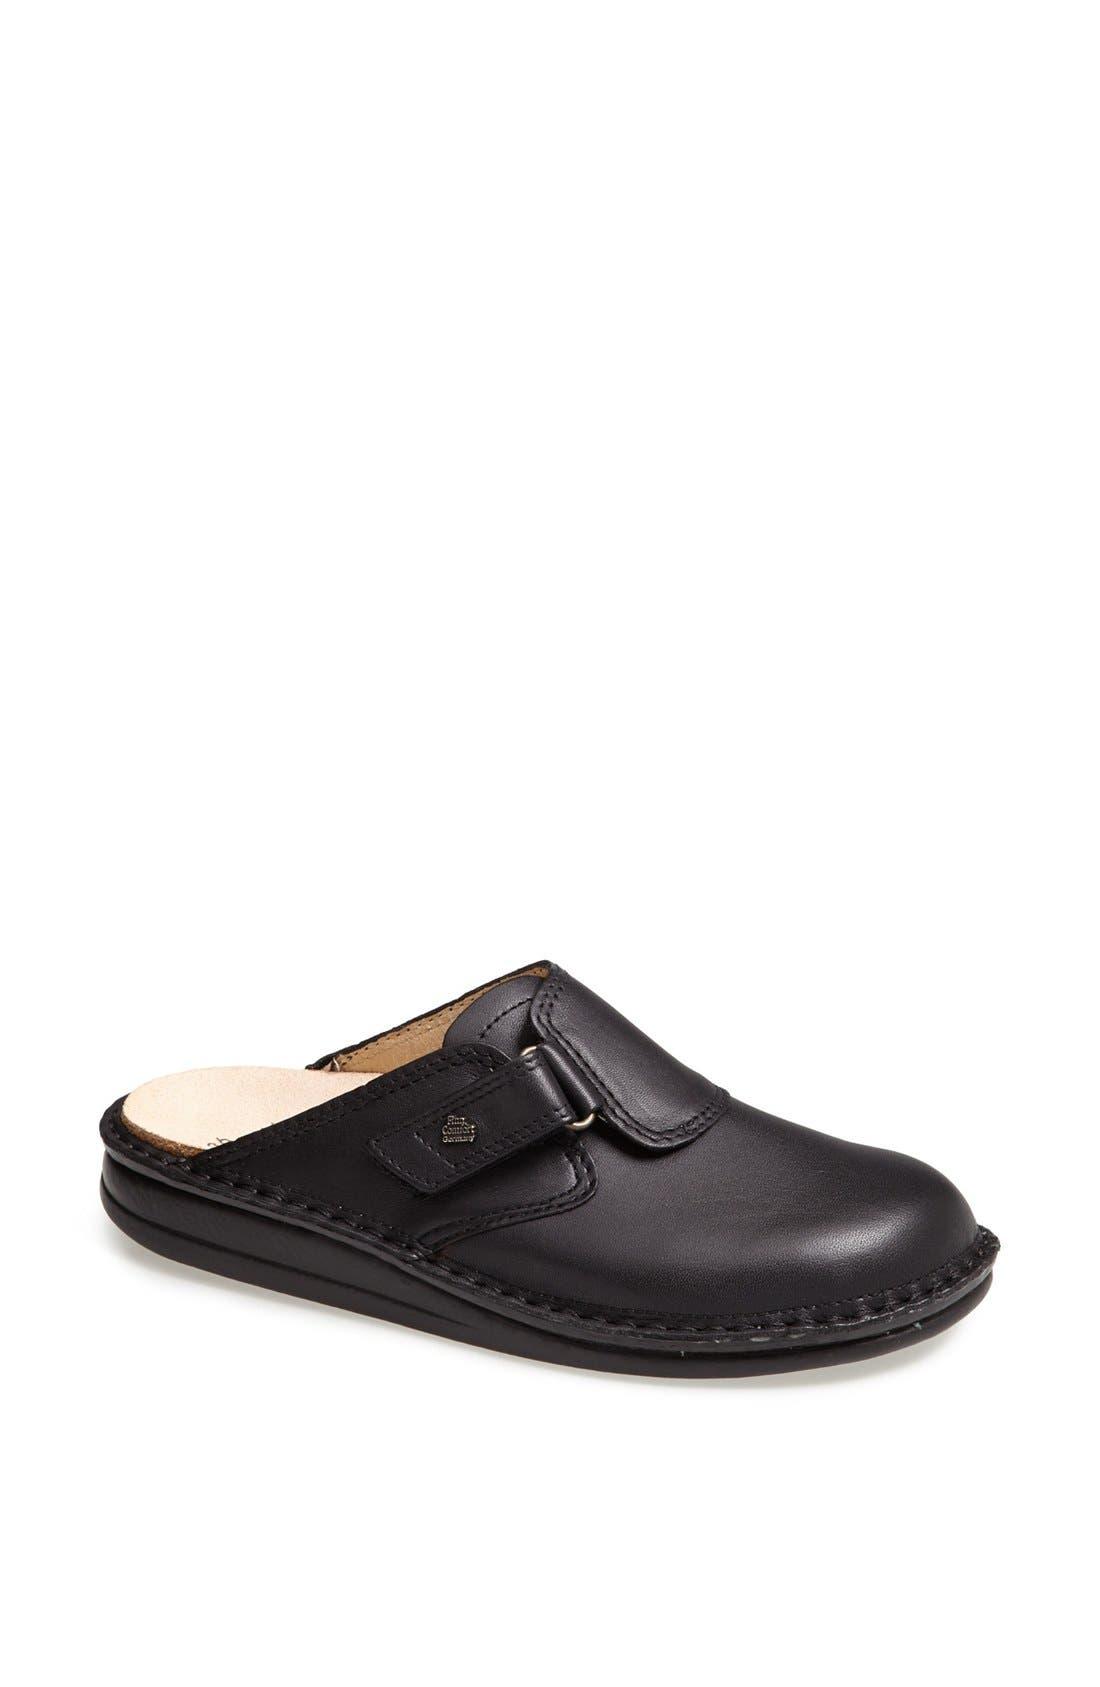 'Venice' Leather Clog,                             Main thumbnail 1, color,                             Black